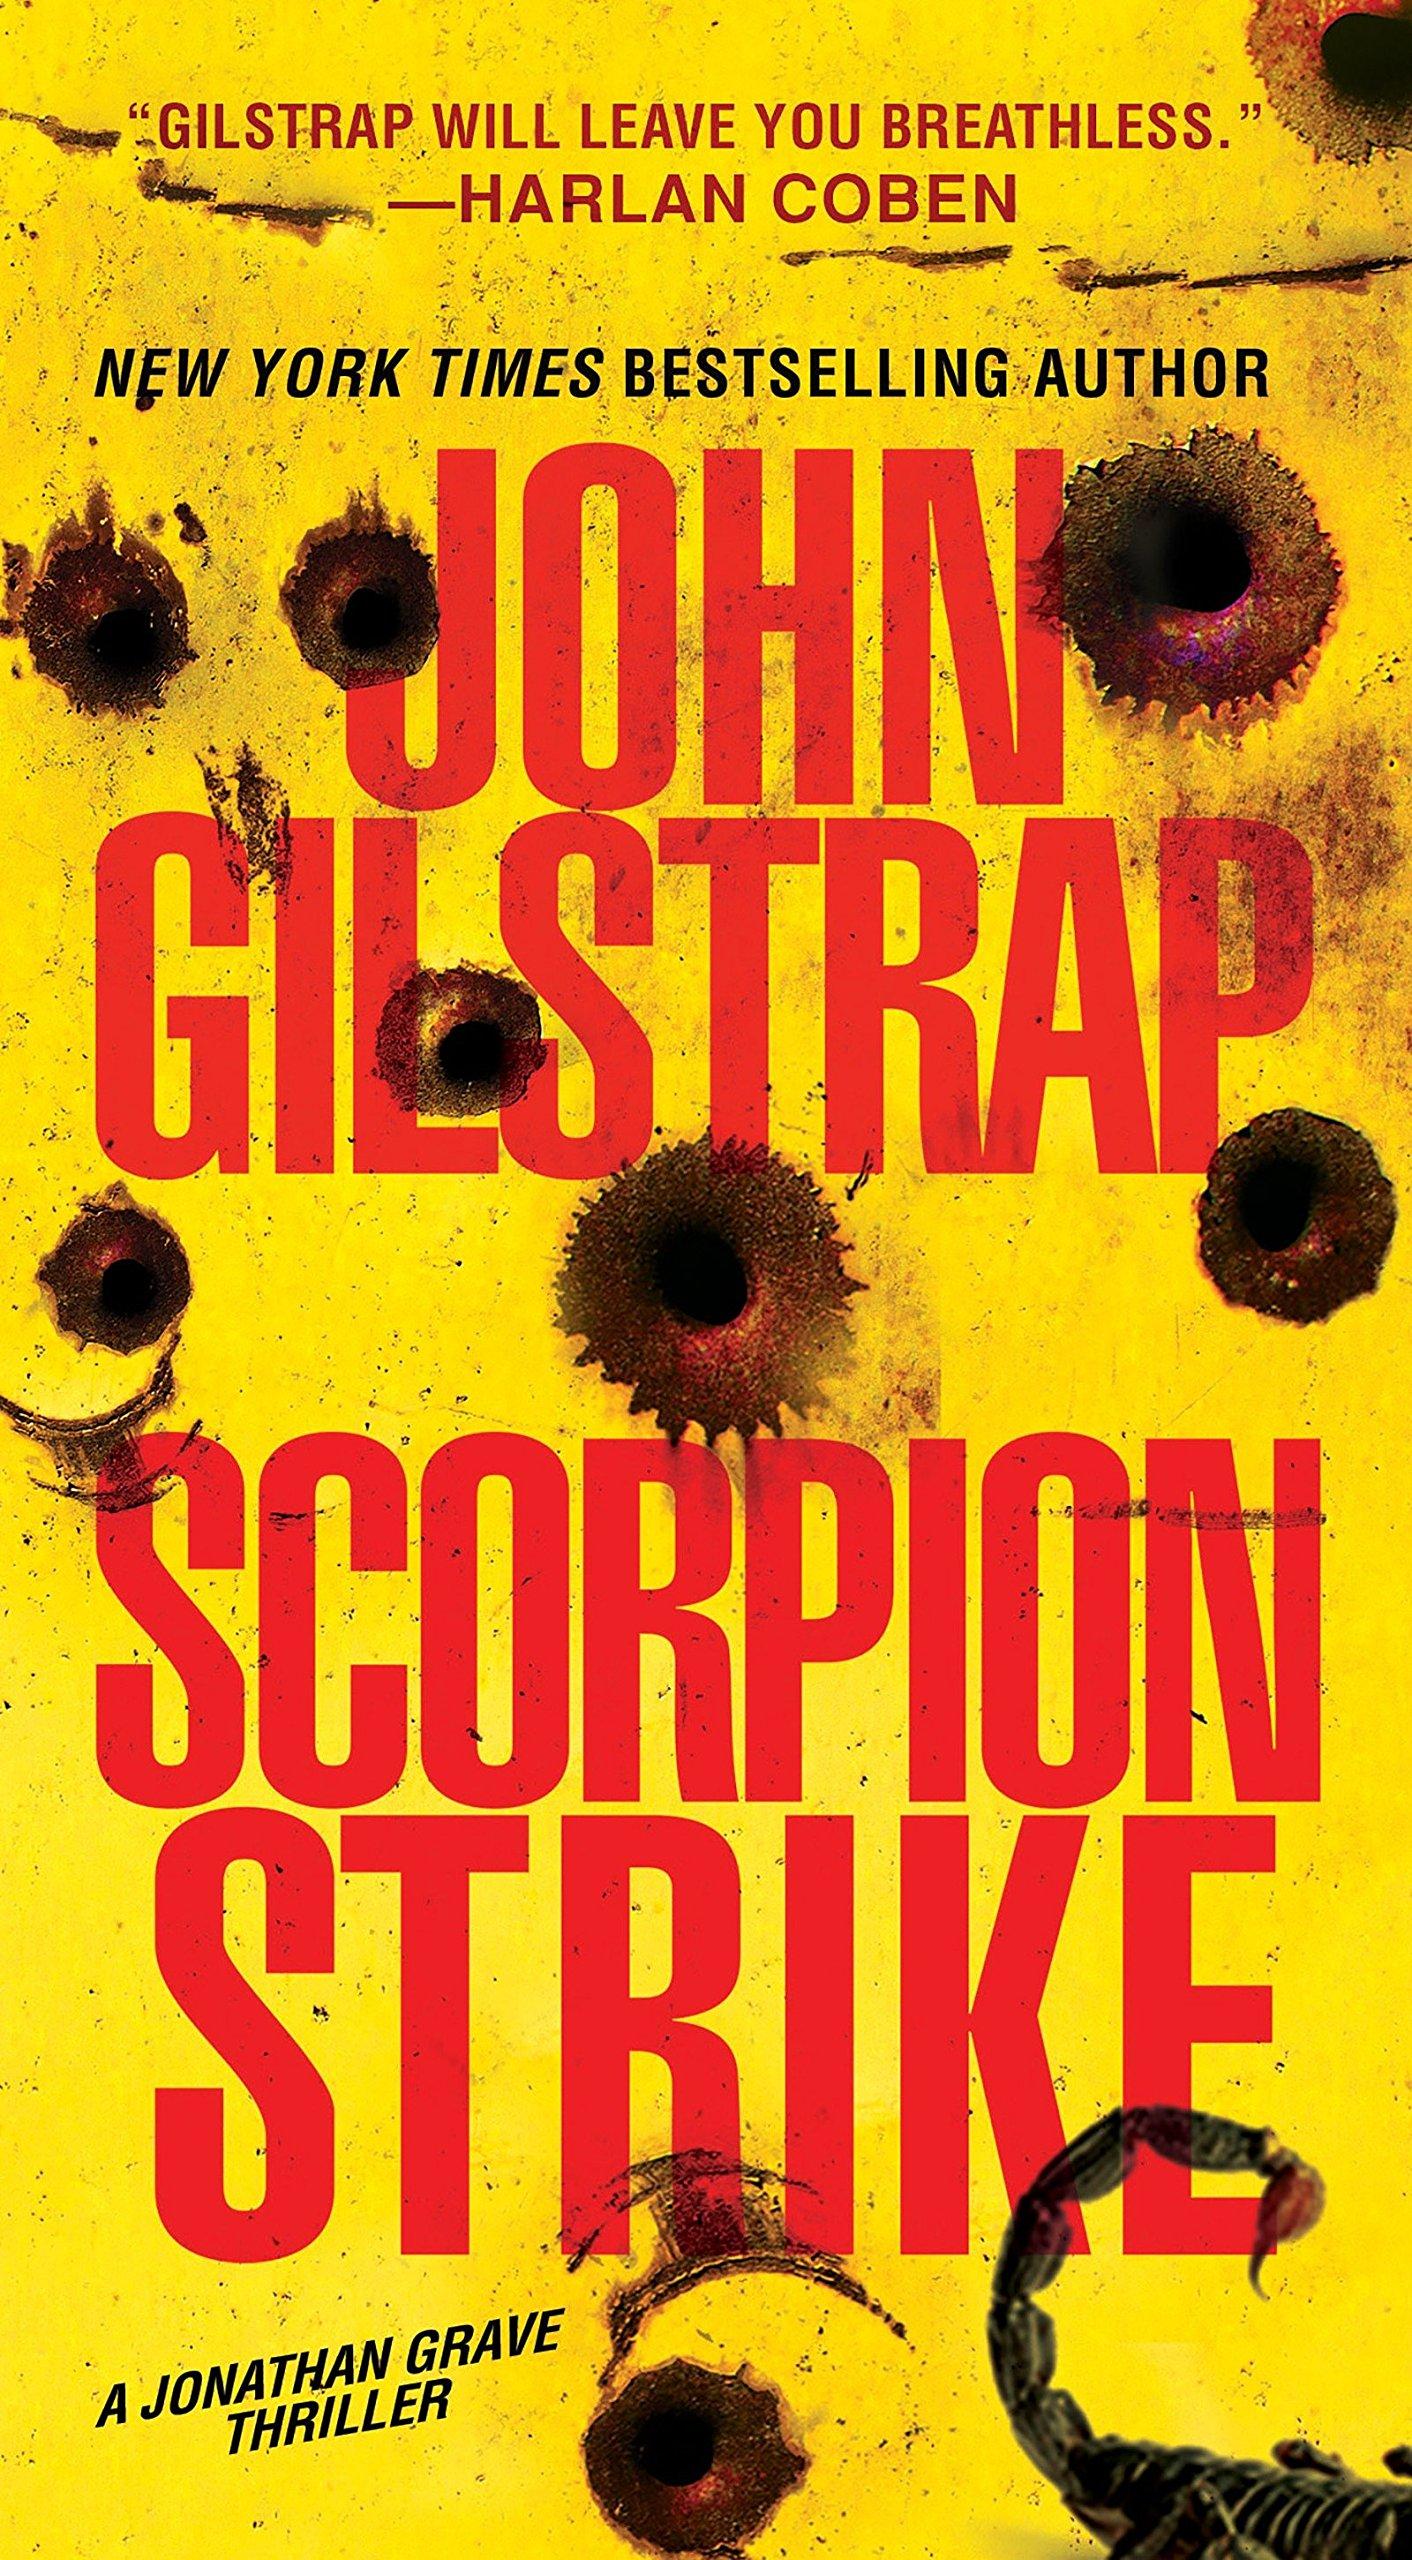 Amazon.com: Scorpion Strike (A Jonathan Grave Thriller) (9780786039807):  John Gilstrap: Books